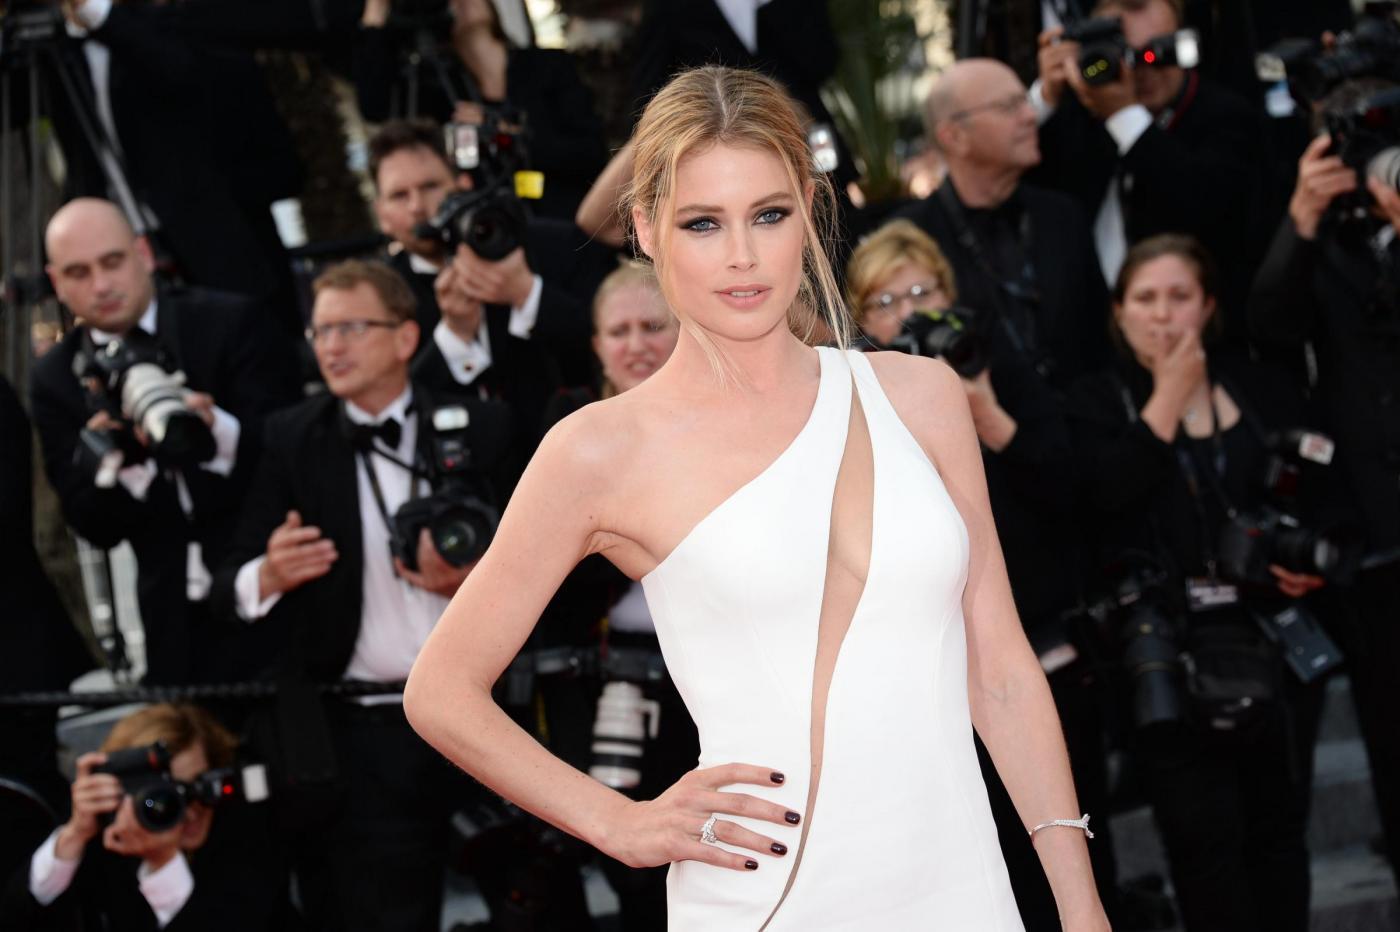 Festival di Cannes 2015 red carpet cerimonia d'apertura